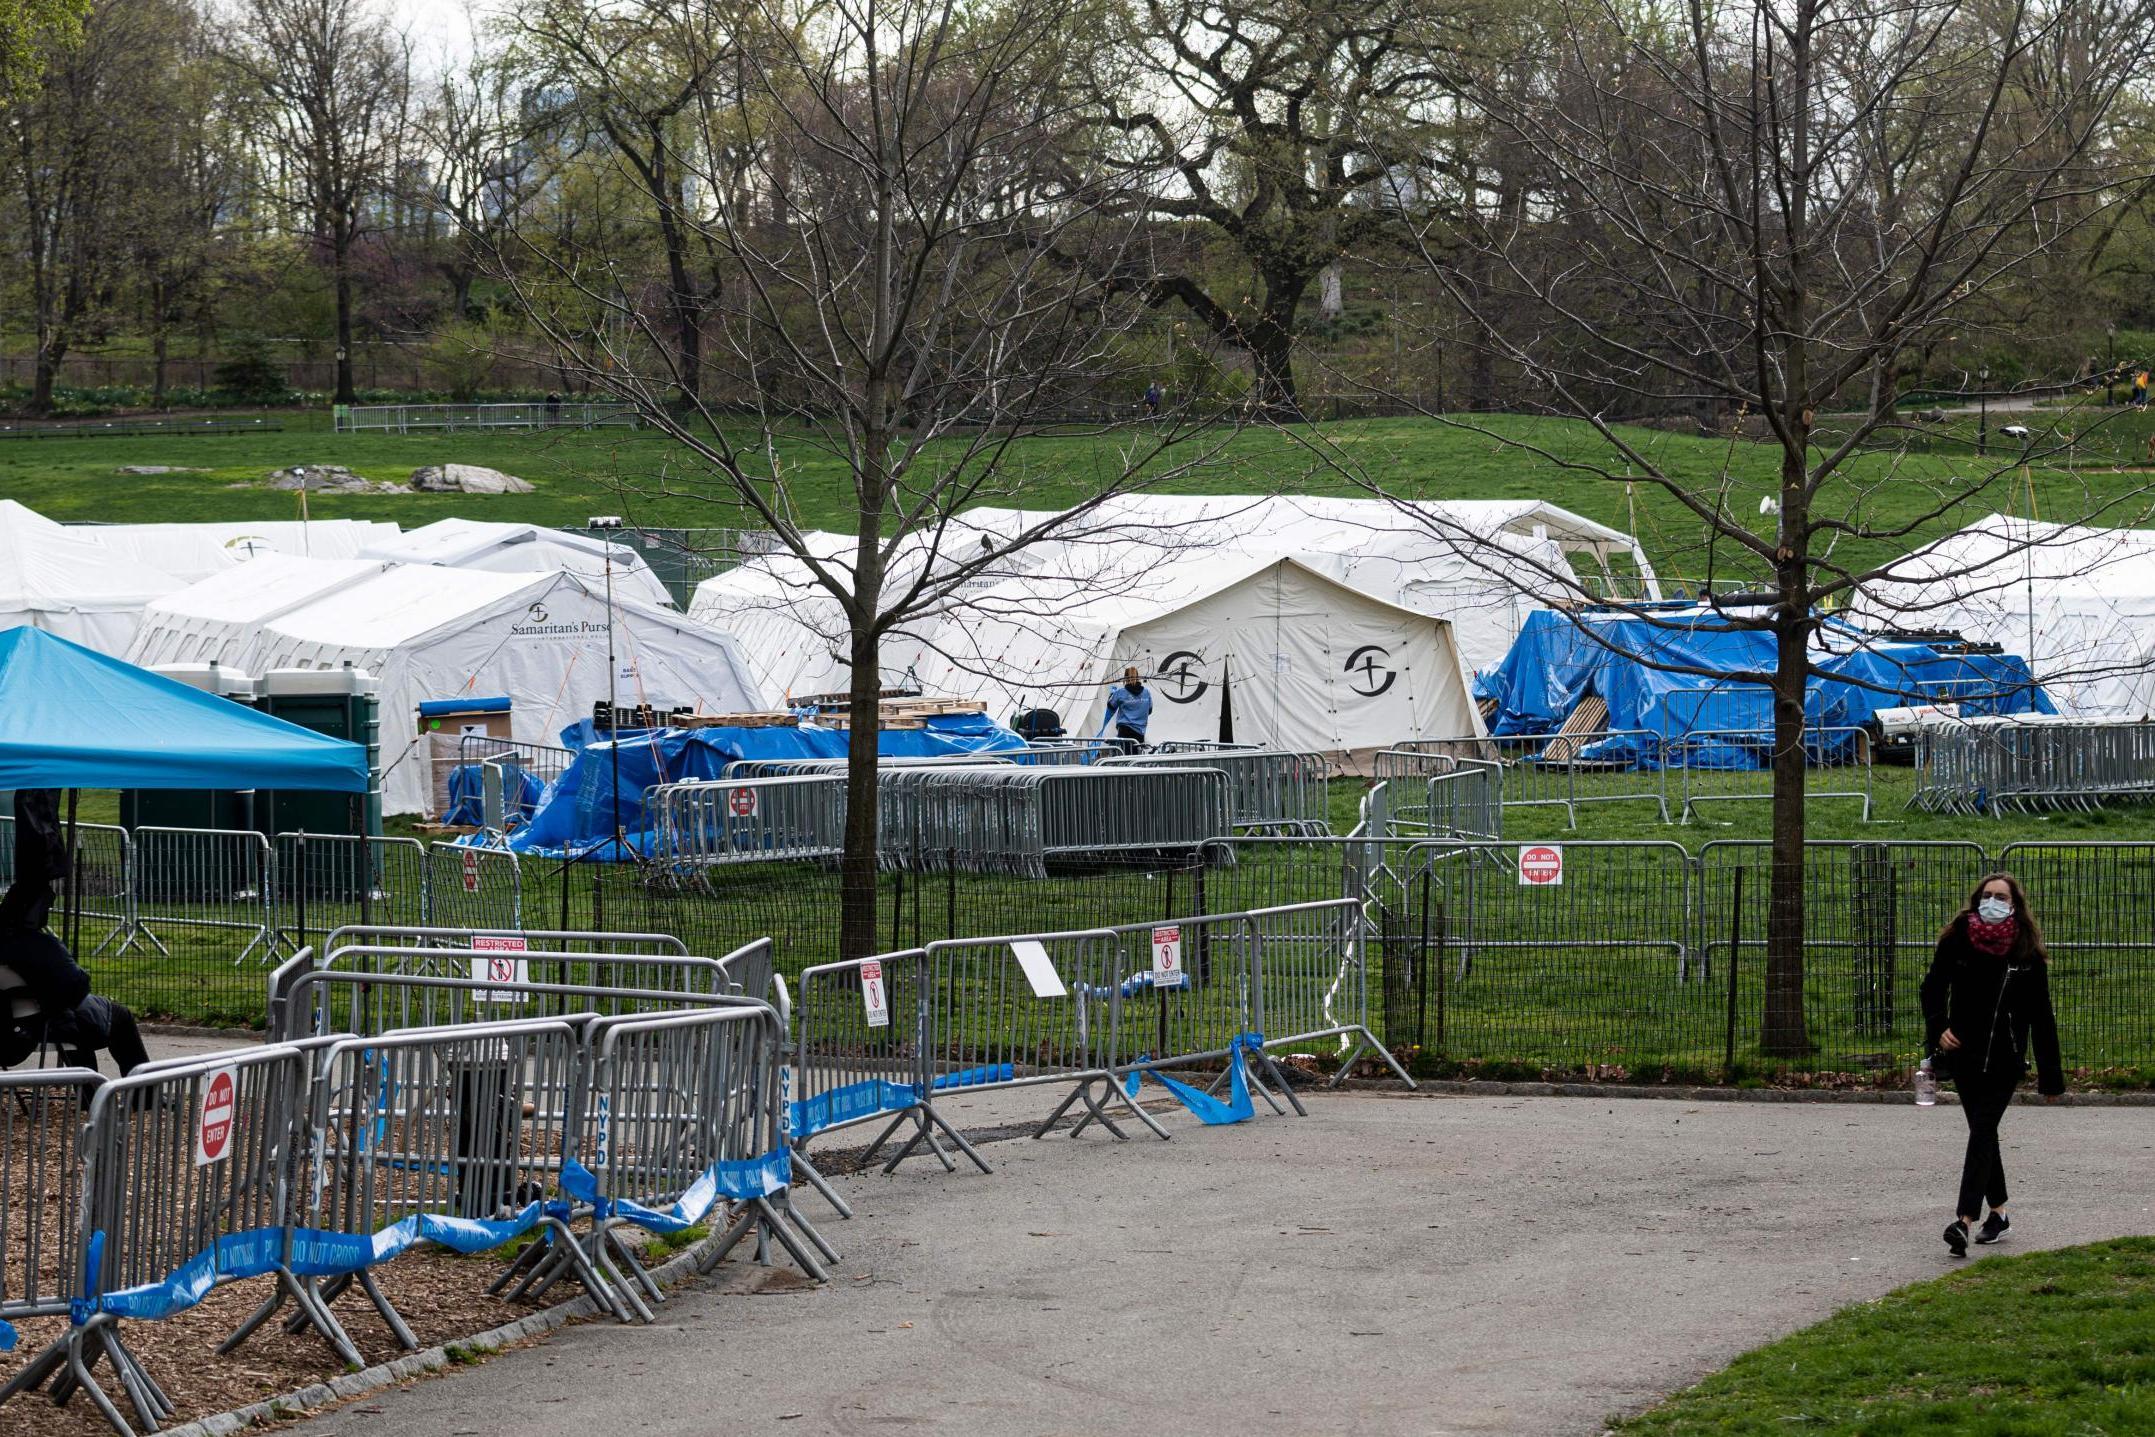 Coronavirus: New York City's temporary Central Park field hospital is set to close as Covid-19 cases decline photo